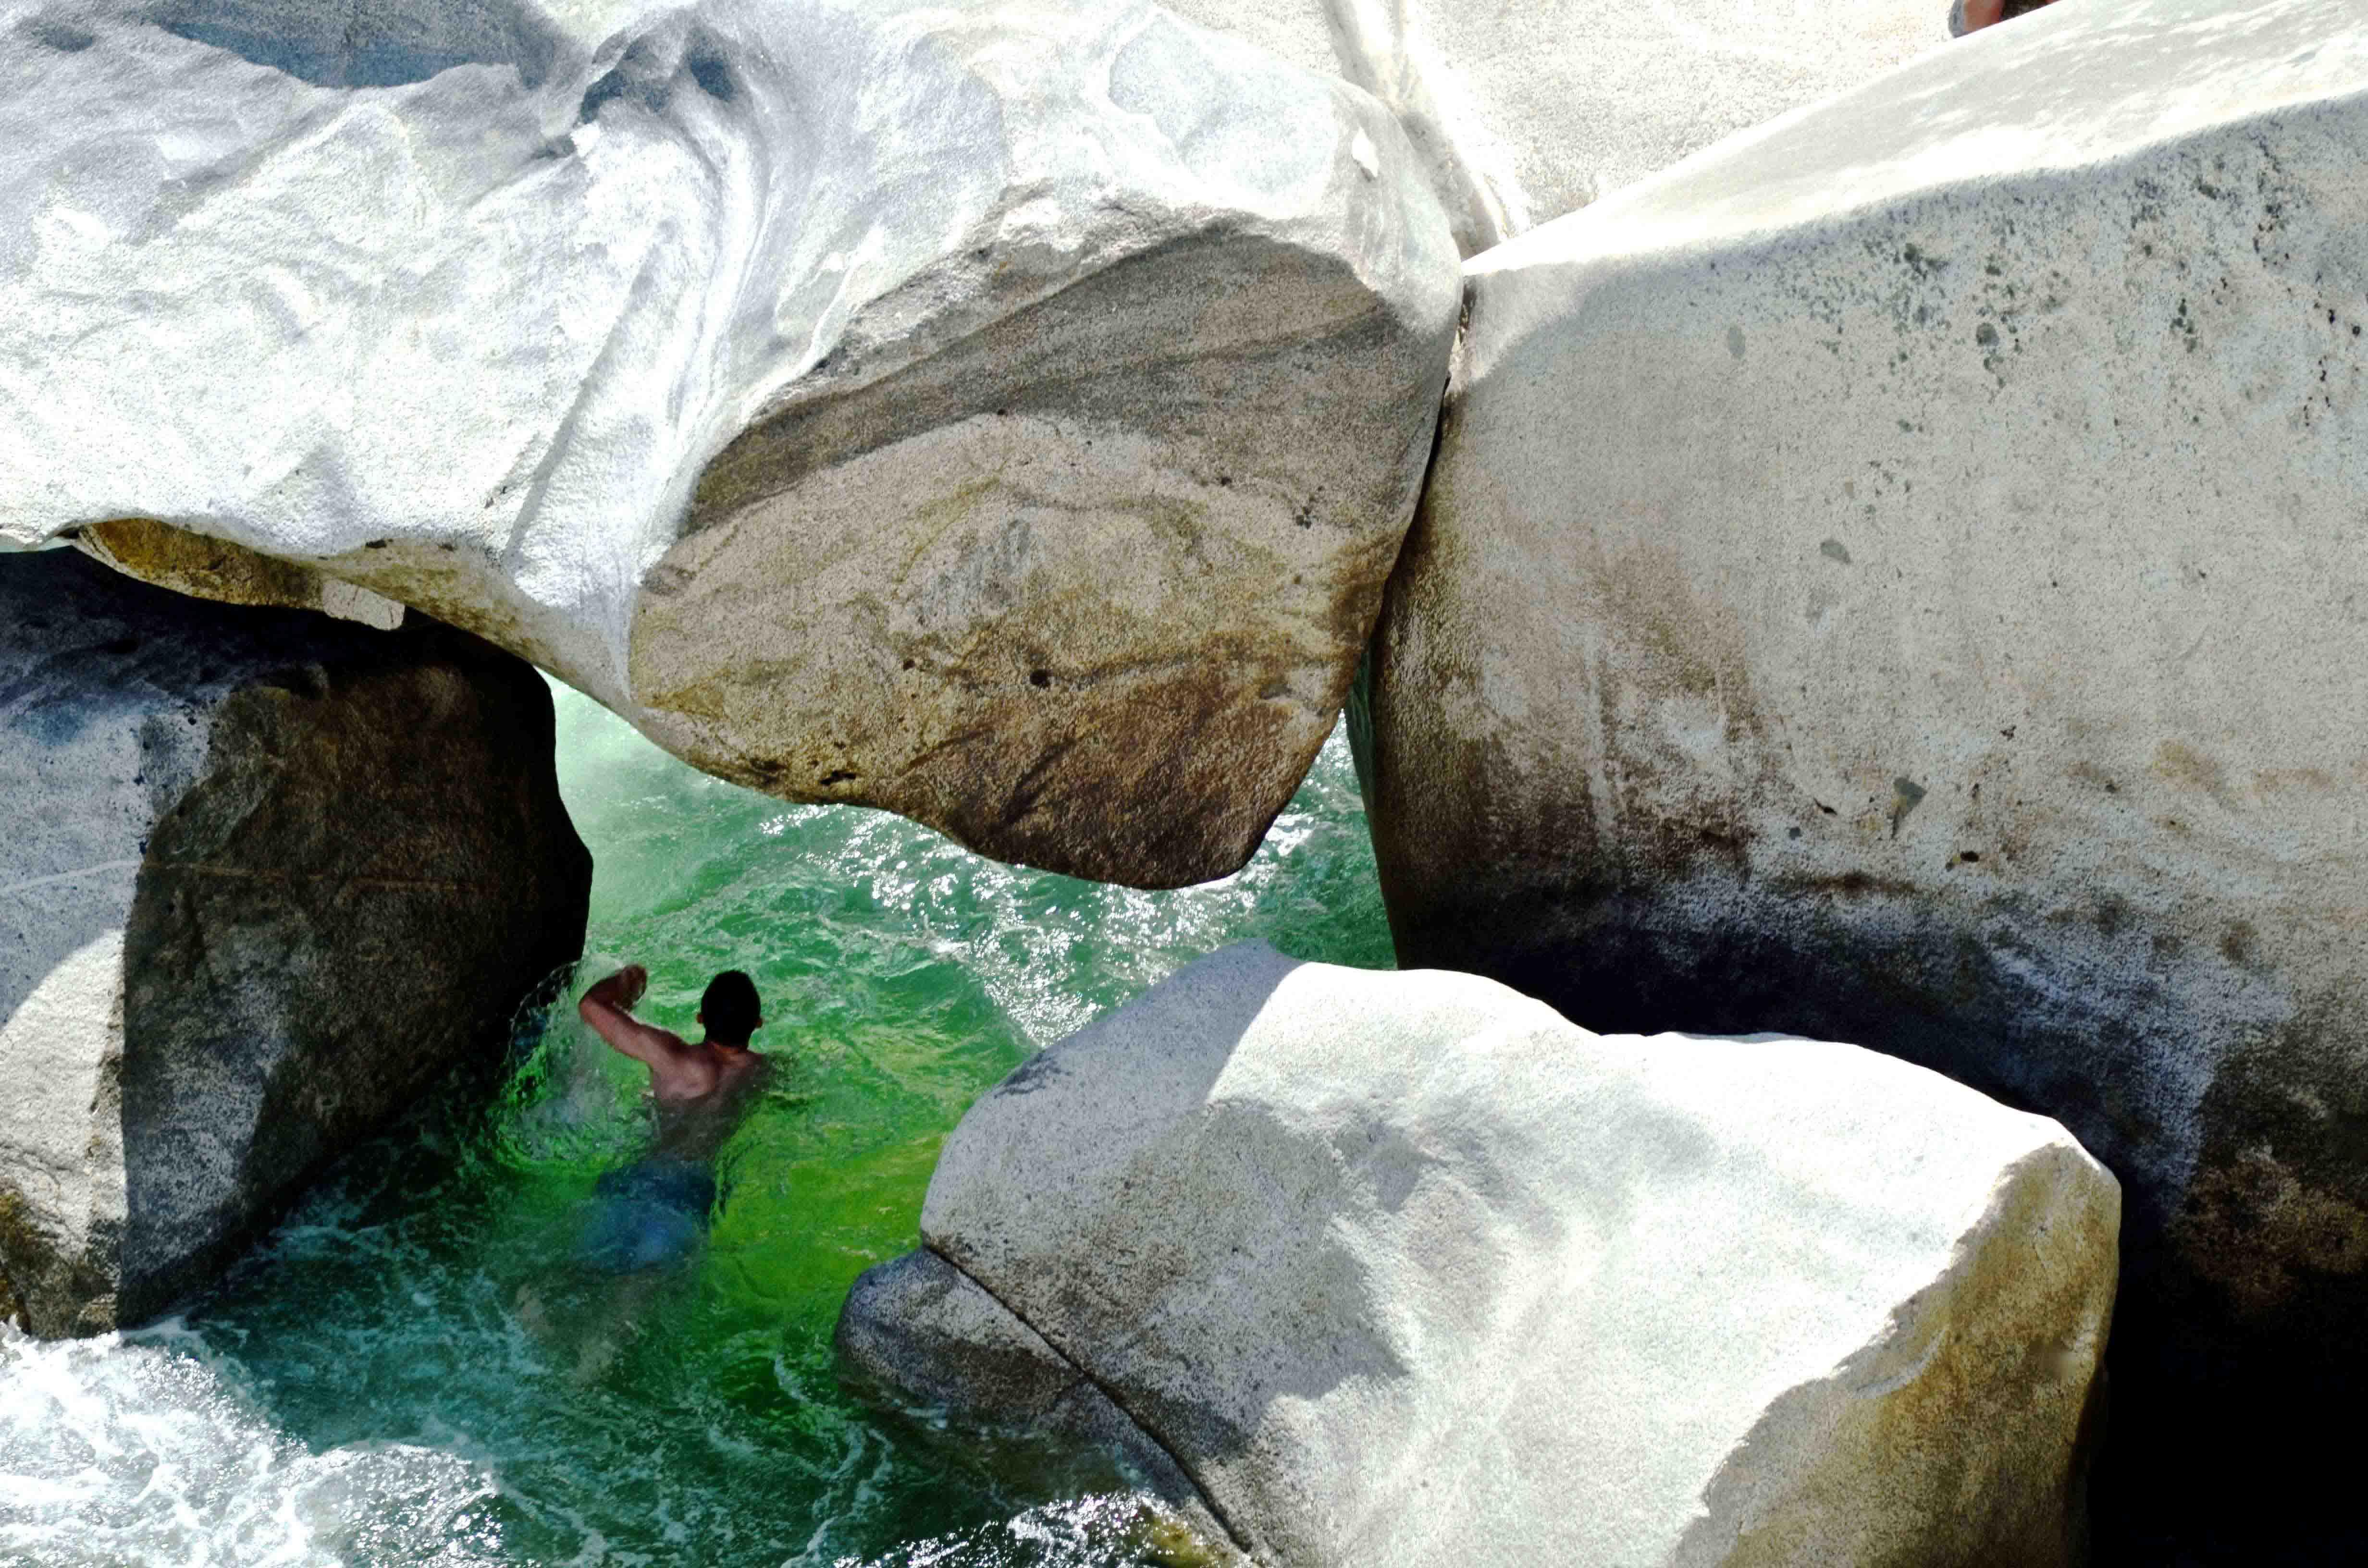 The-River-Yuba,-California-most-interesting-places-to-swim